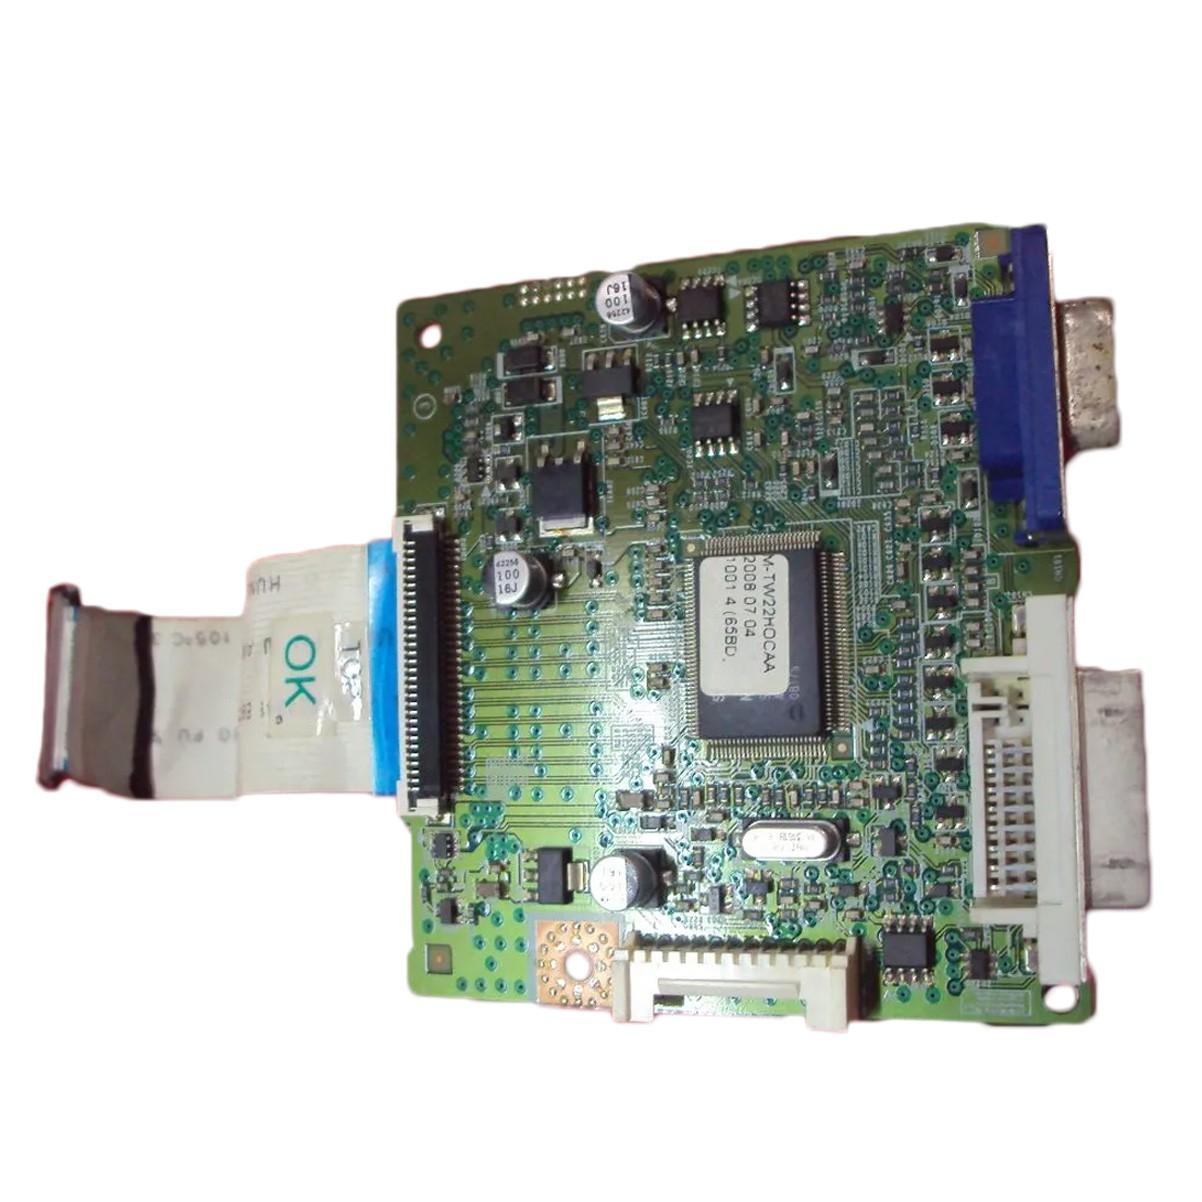 Placa Lógica Monitor Samsung T220 + Cabo Flat Da Tela  PN: Bn41-01029a - Retirado